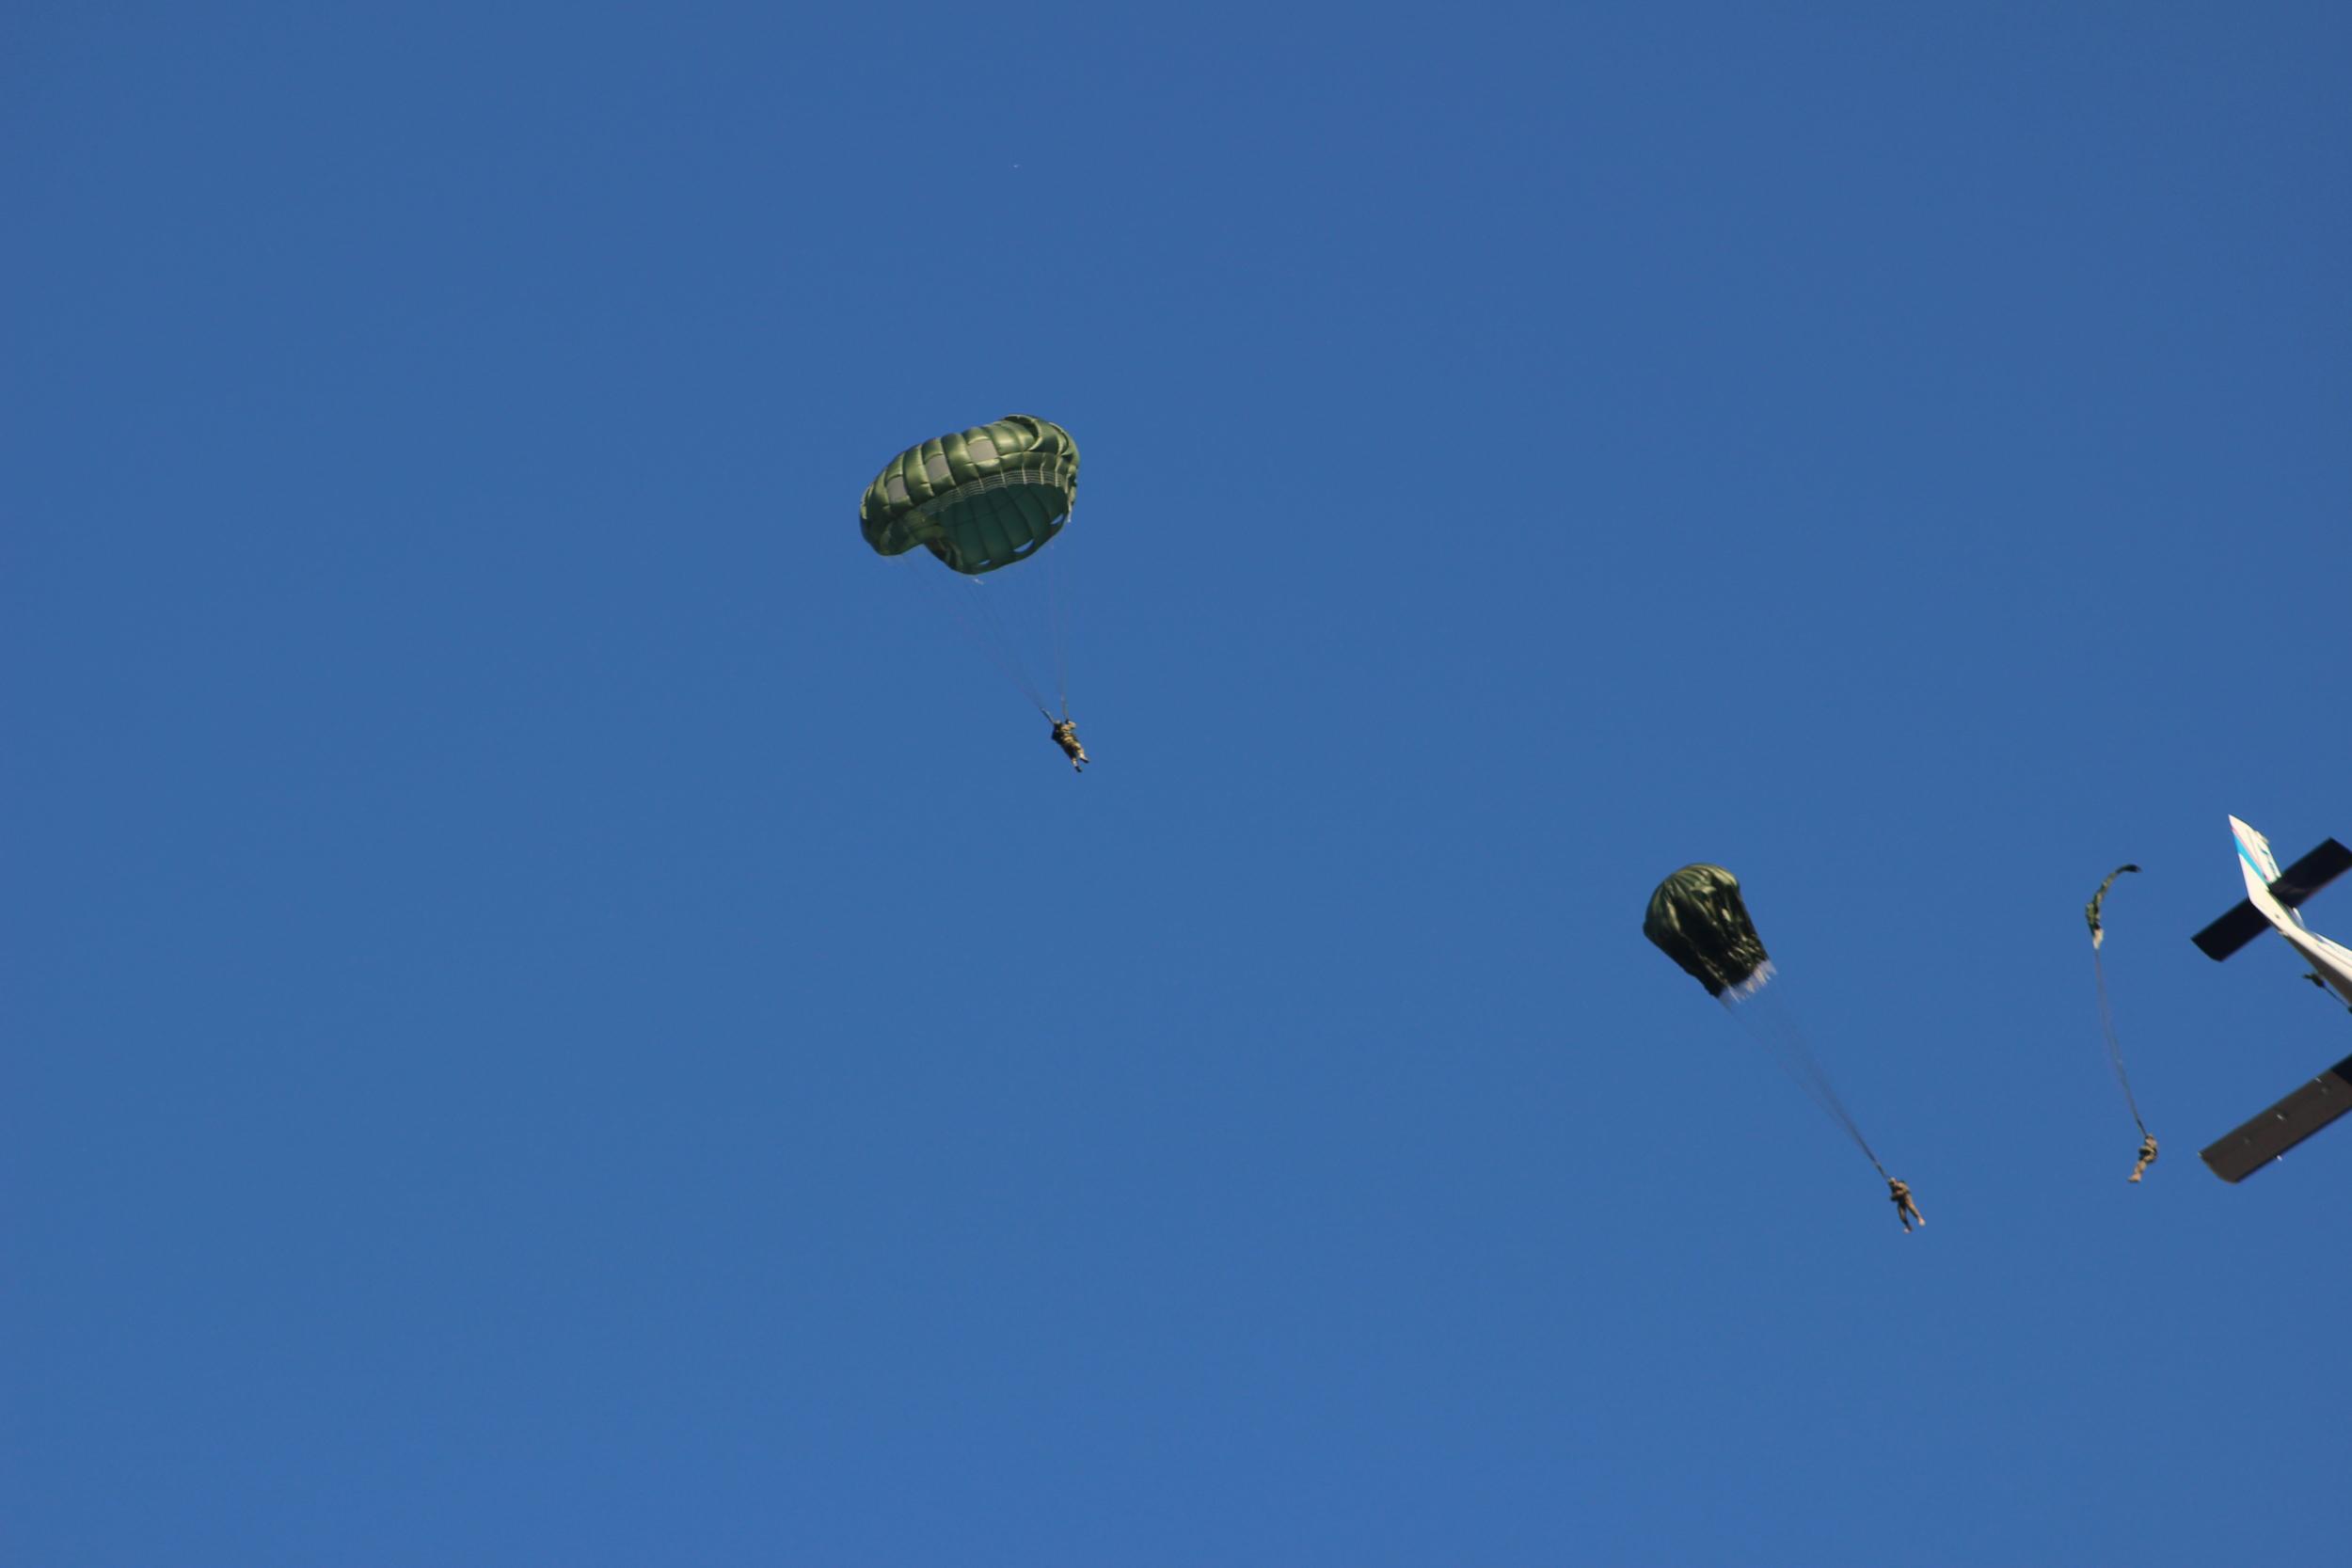 Lisa pics from jump event - 13feb16 (37).JPG